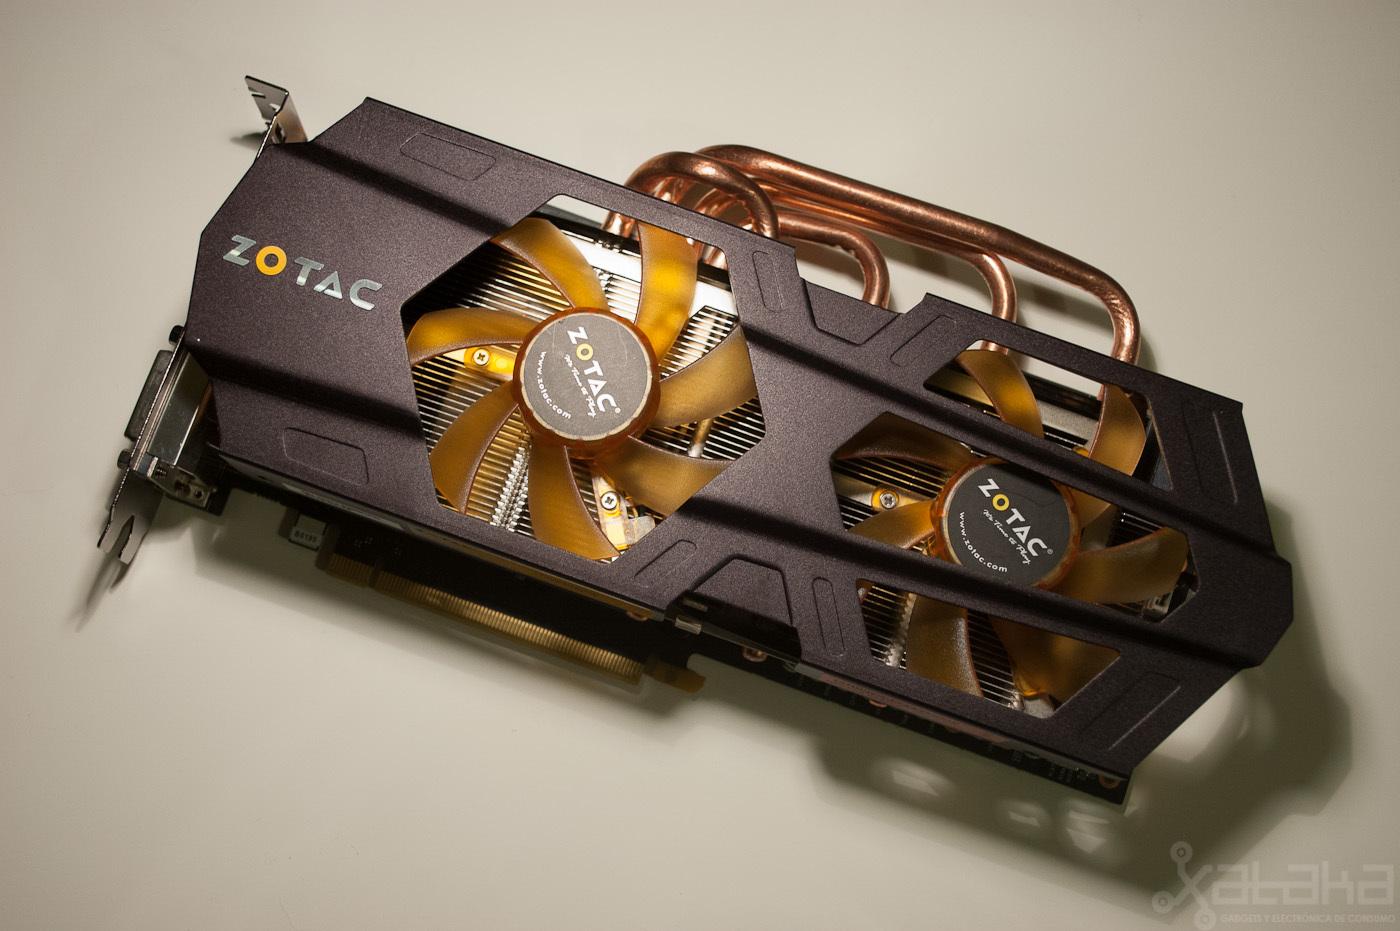 Foto de Zotac NVidia GTX 670, análisis (9/9)